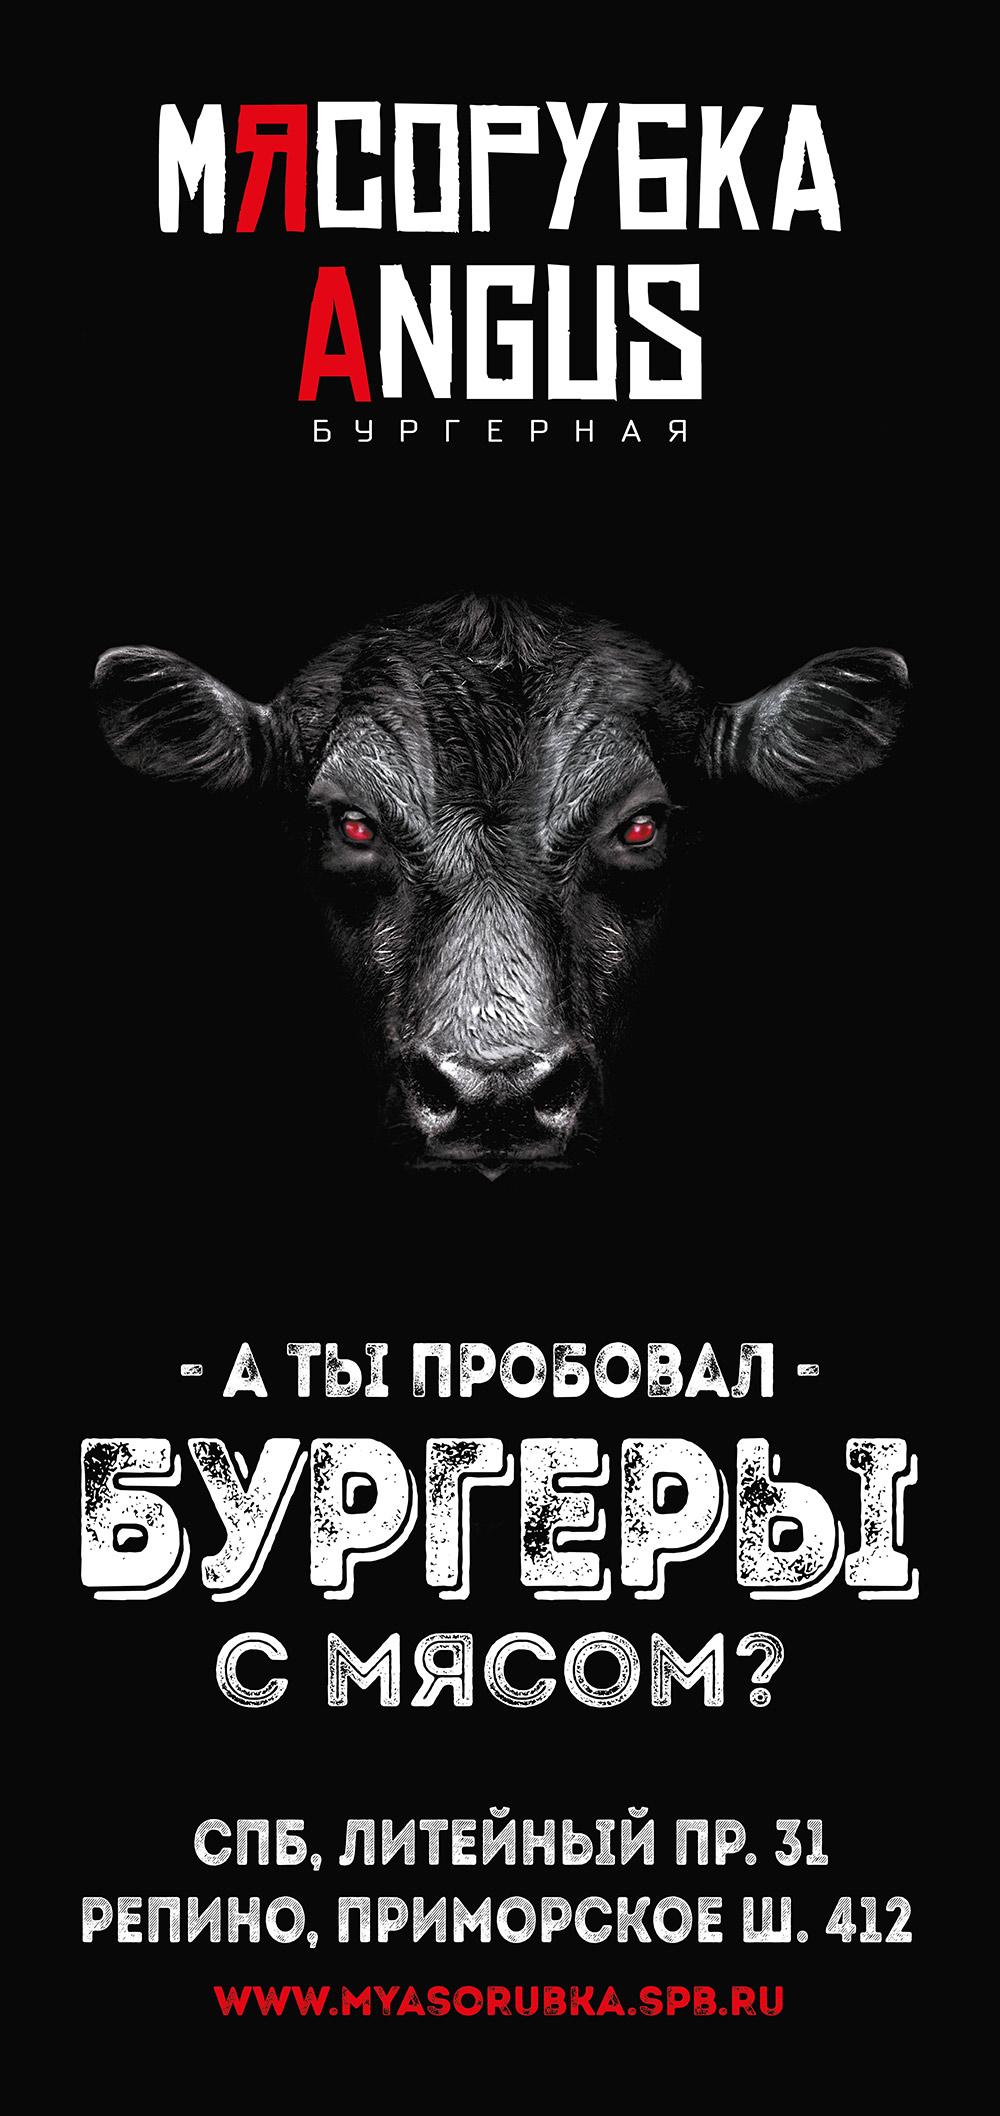 Наружная реклама бургерной Мясорубка